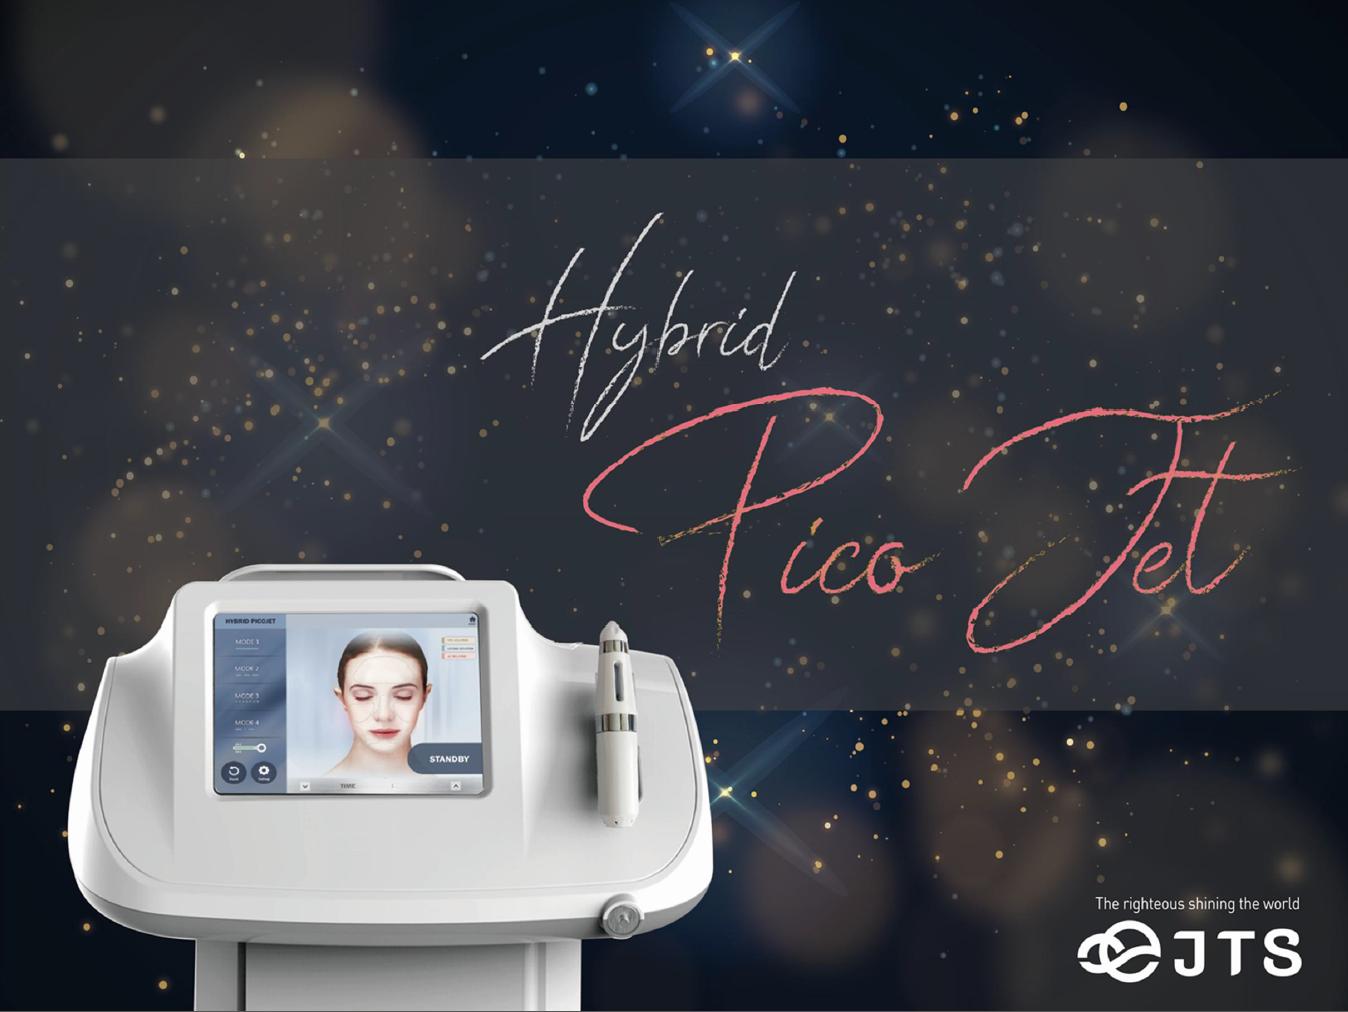 hybrid_pico_jet